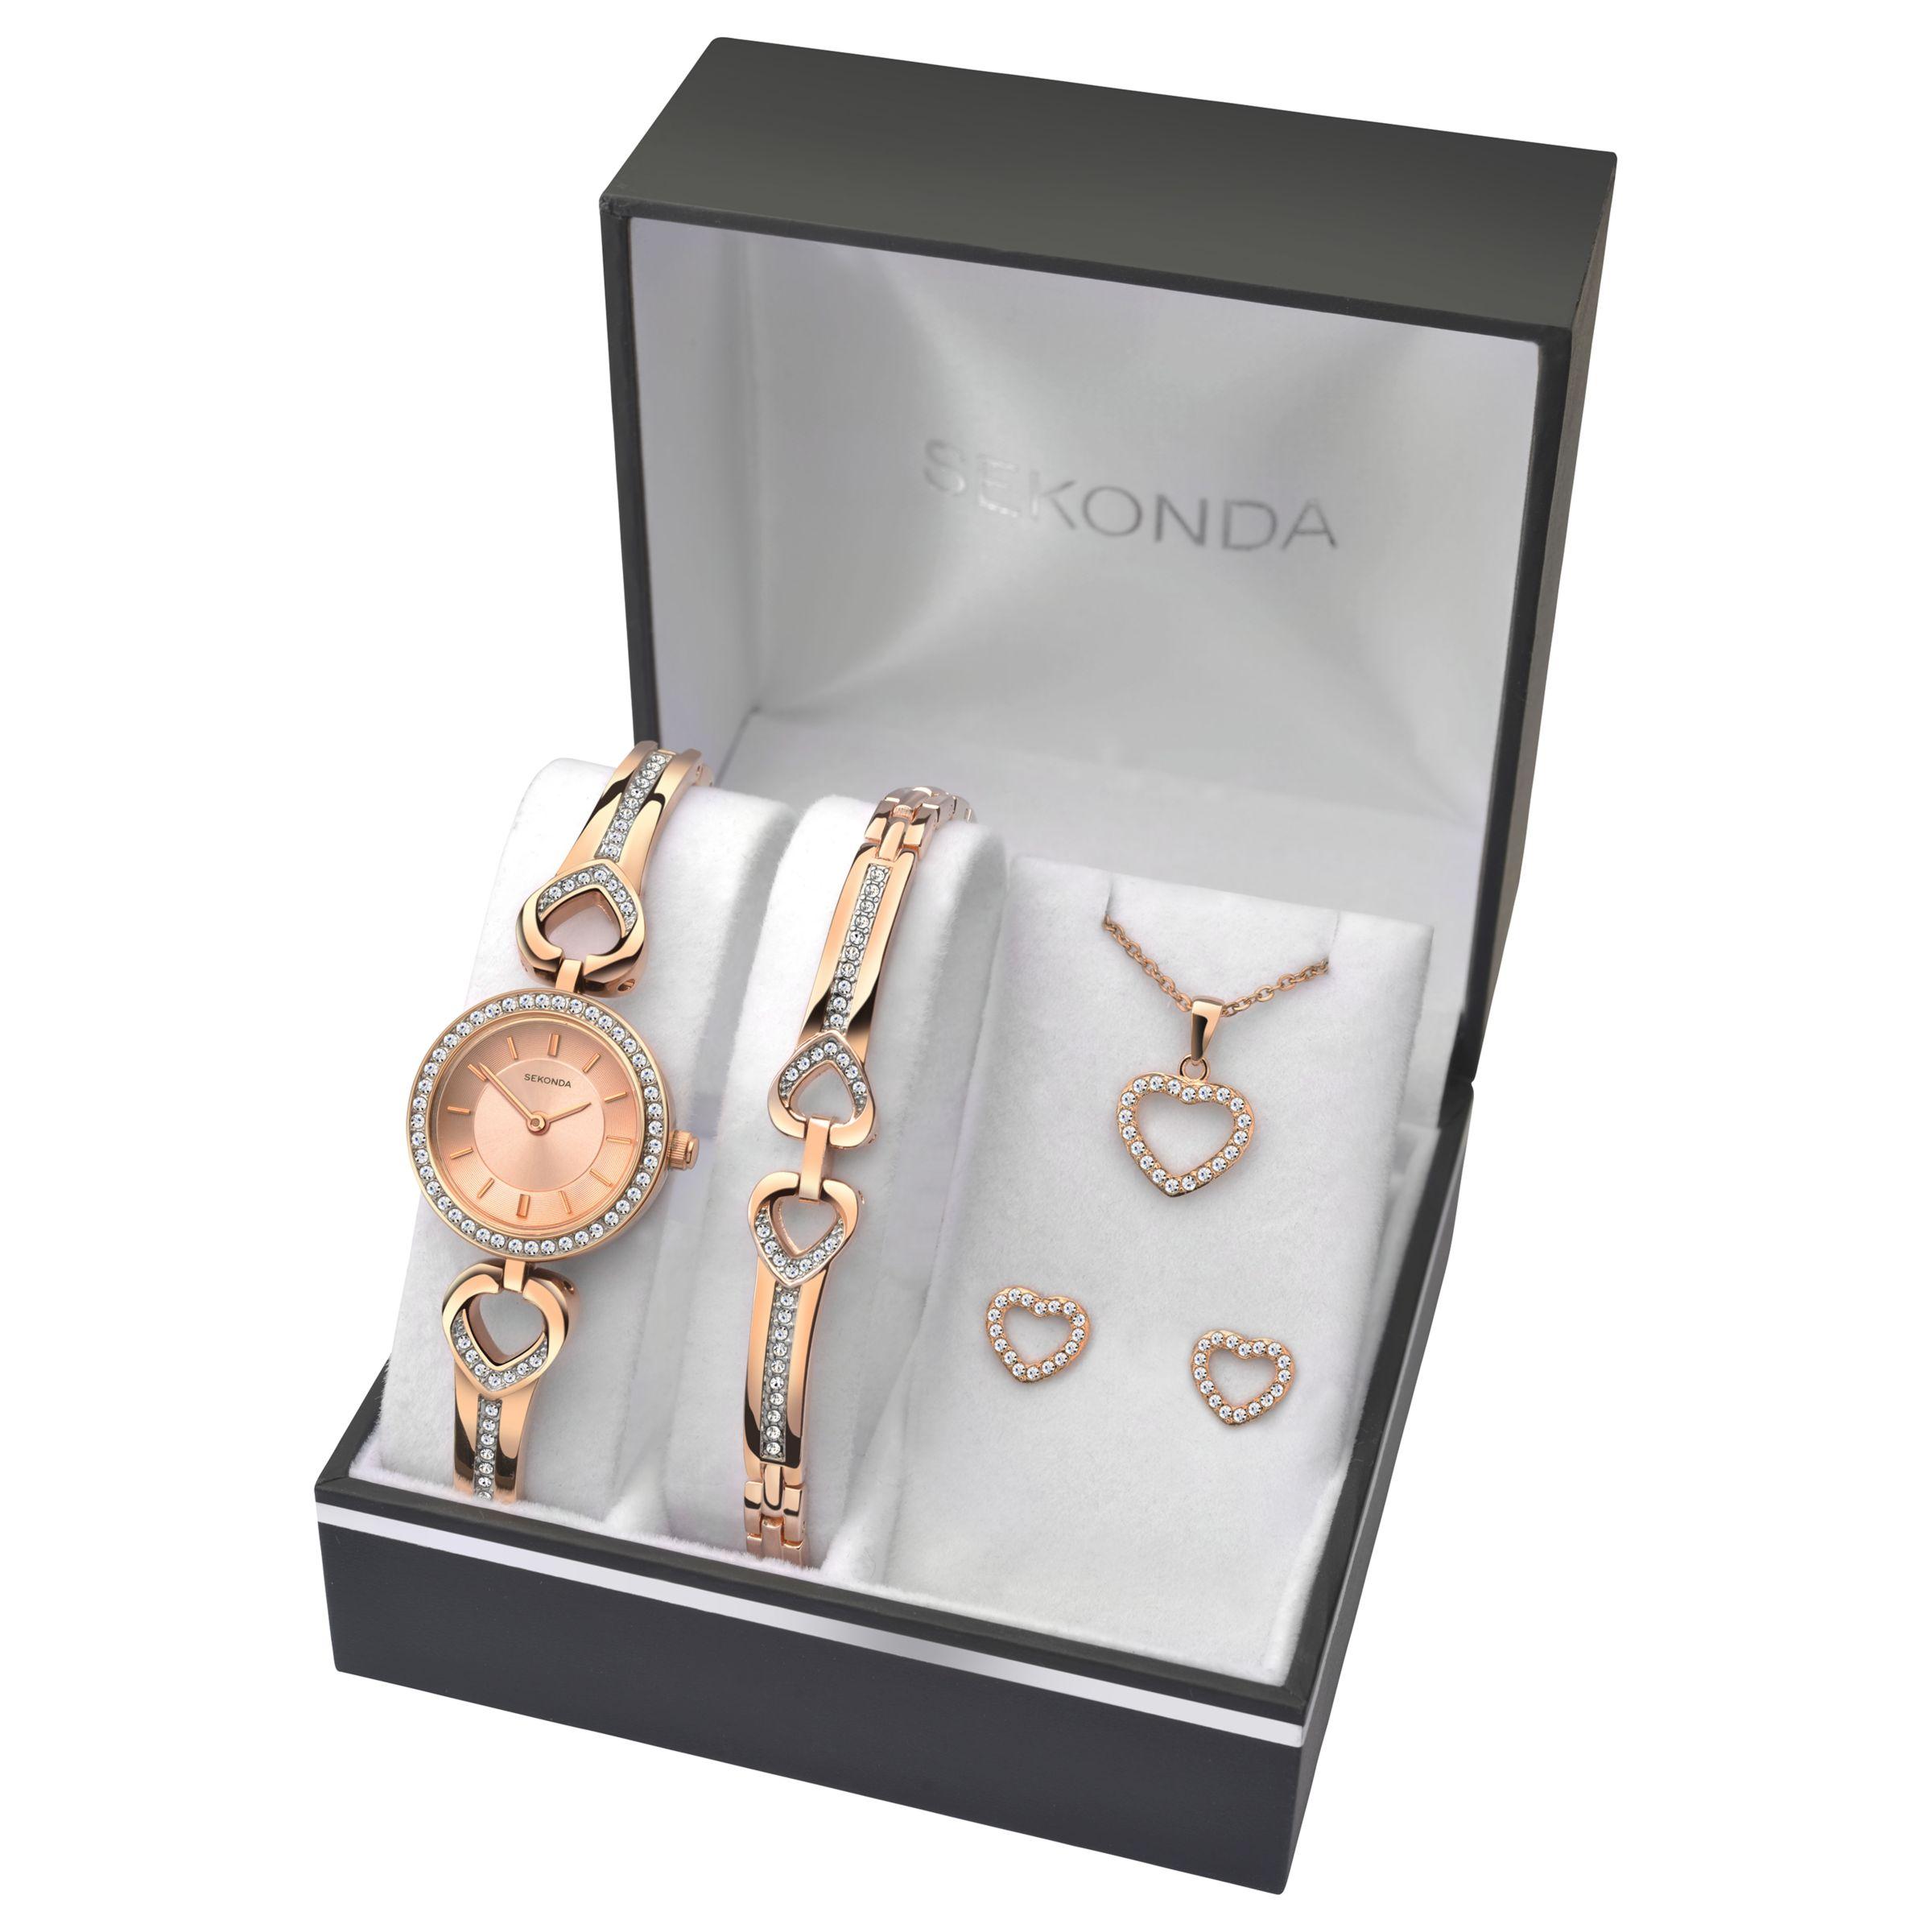 Sekonda Sekonda 2363G Women's Jewellery Strap Watch, Bracelet, Pendant Necklace and Earrings Gift Set, Rose Gold